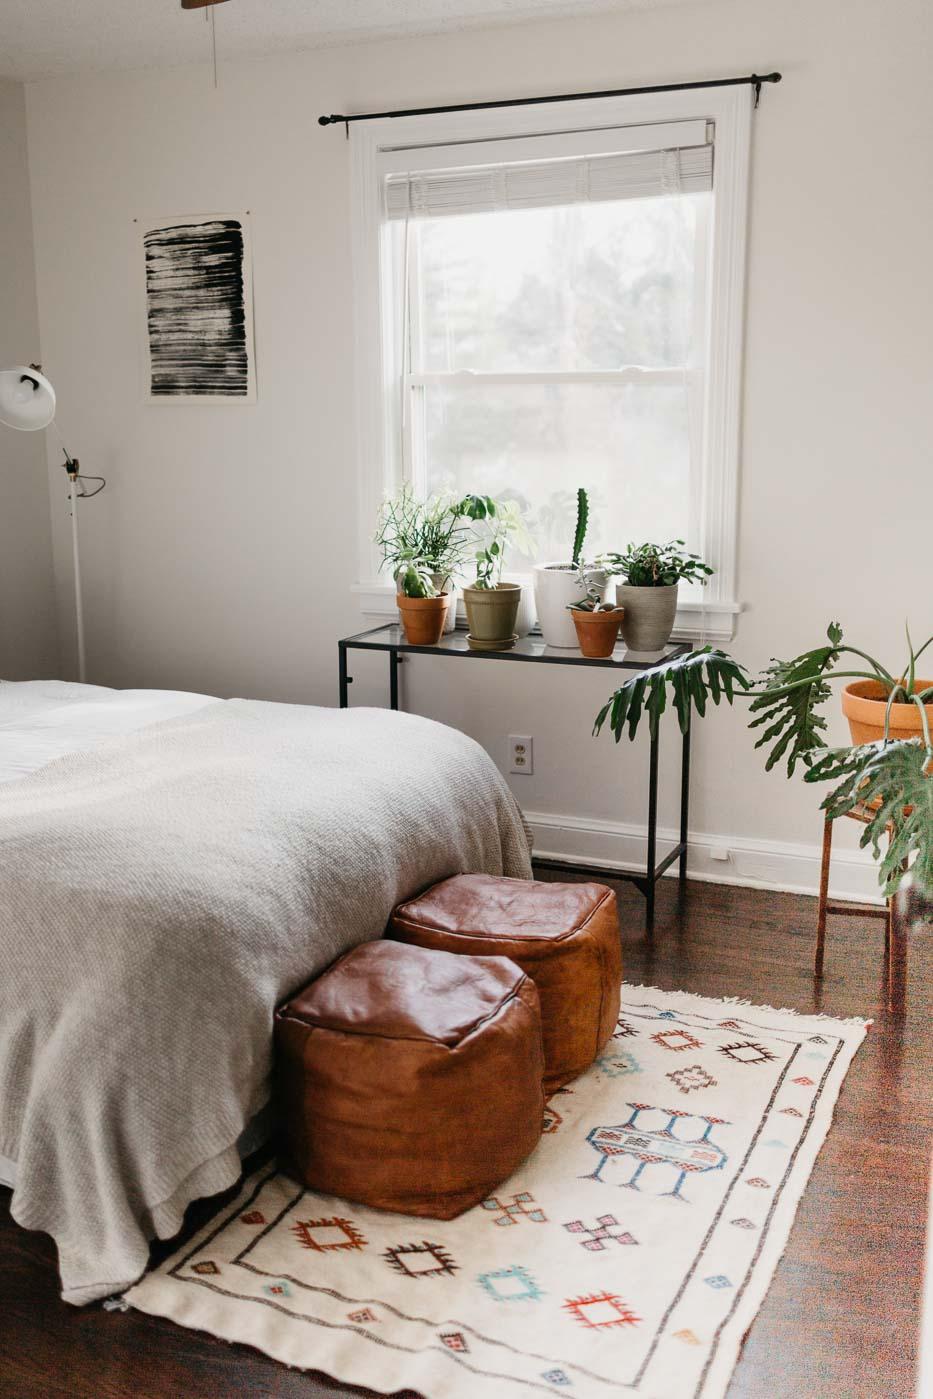 cozy-casa-nashville-tn-natural-light-studio-photography-ideas-lifestyle-photographer-photography-8.jpg